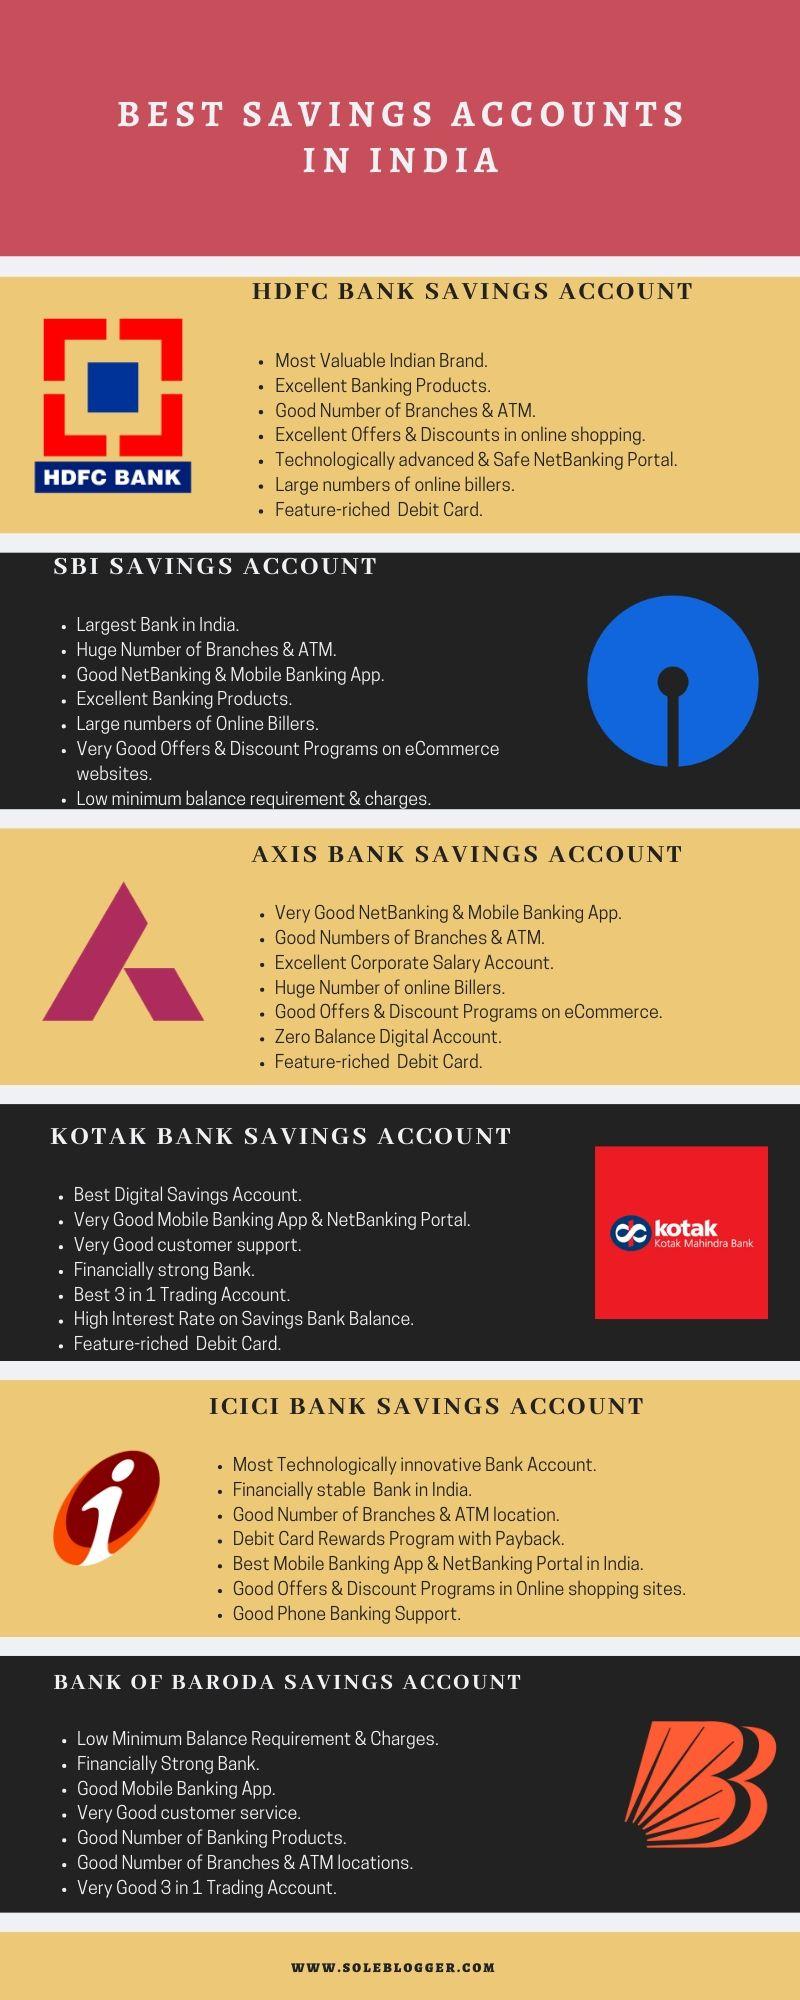 Best Savings Account India